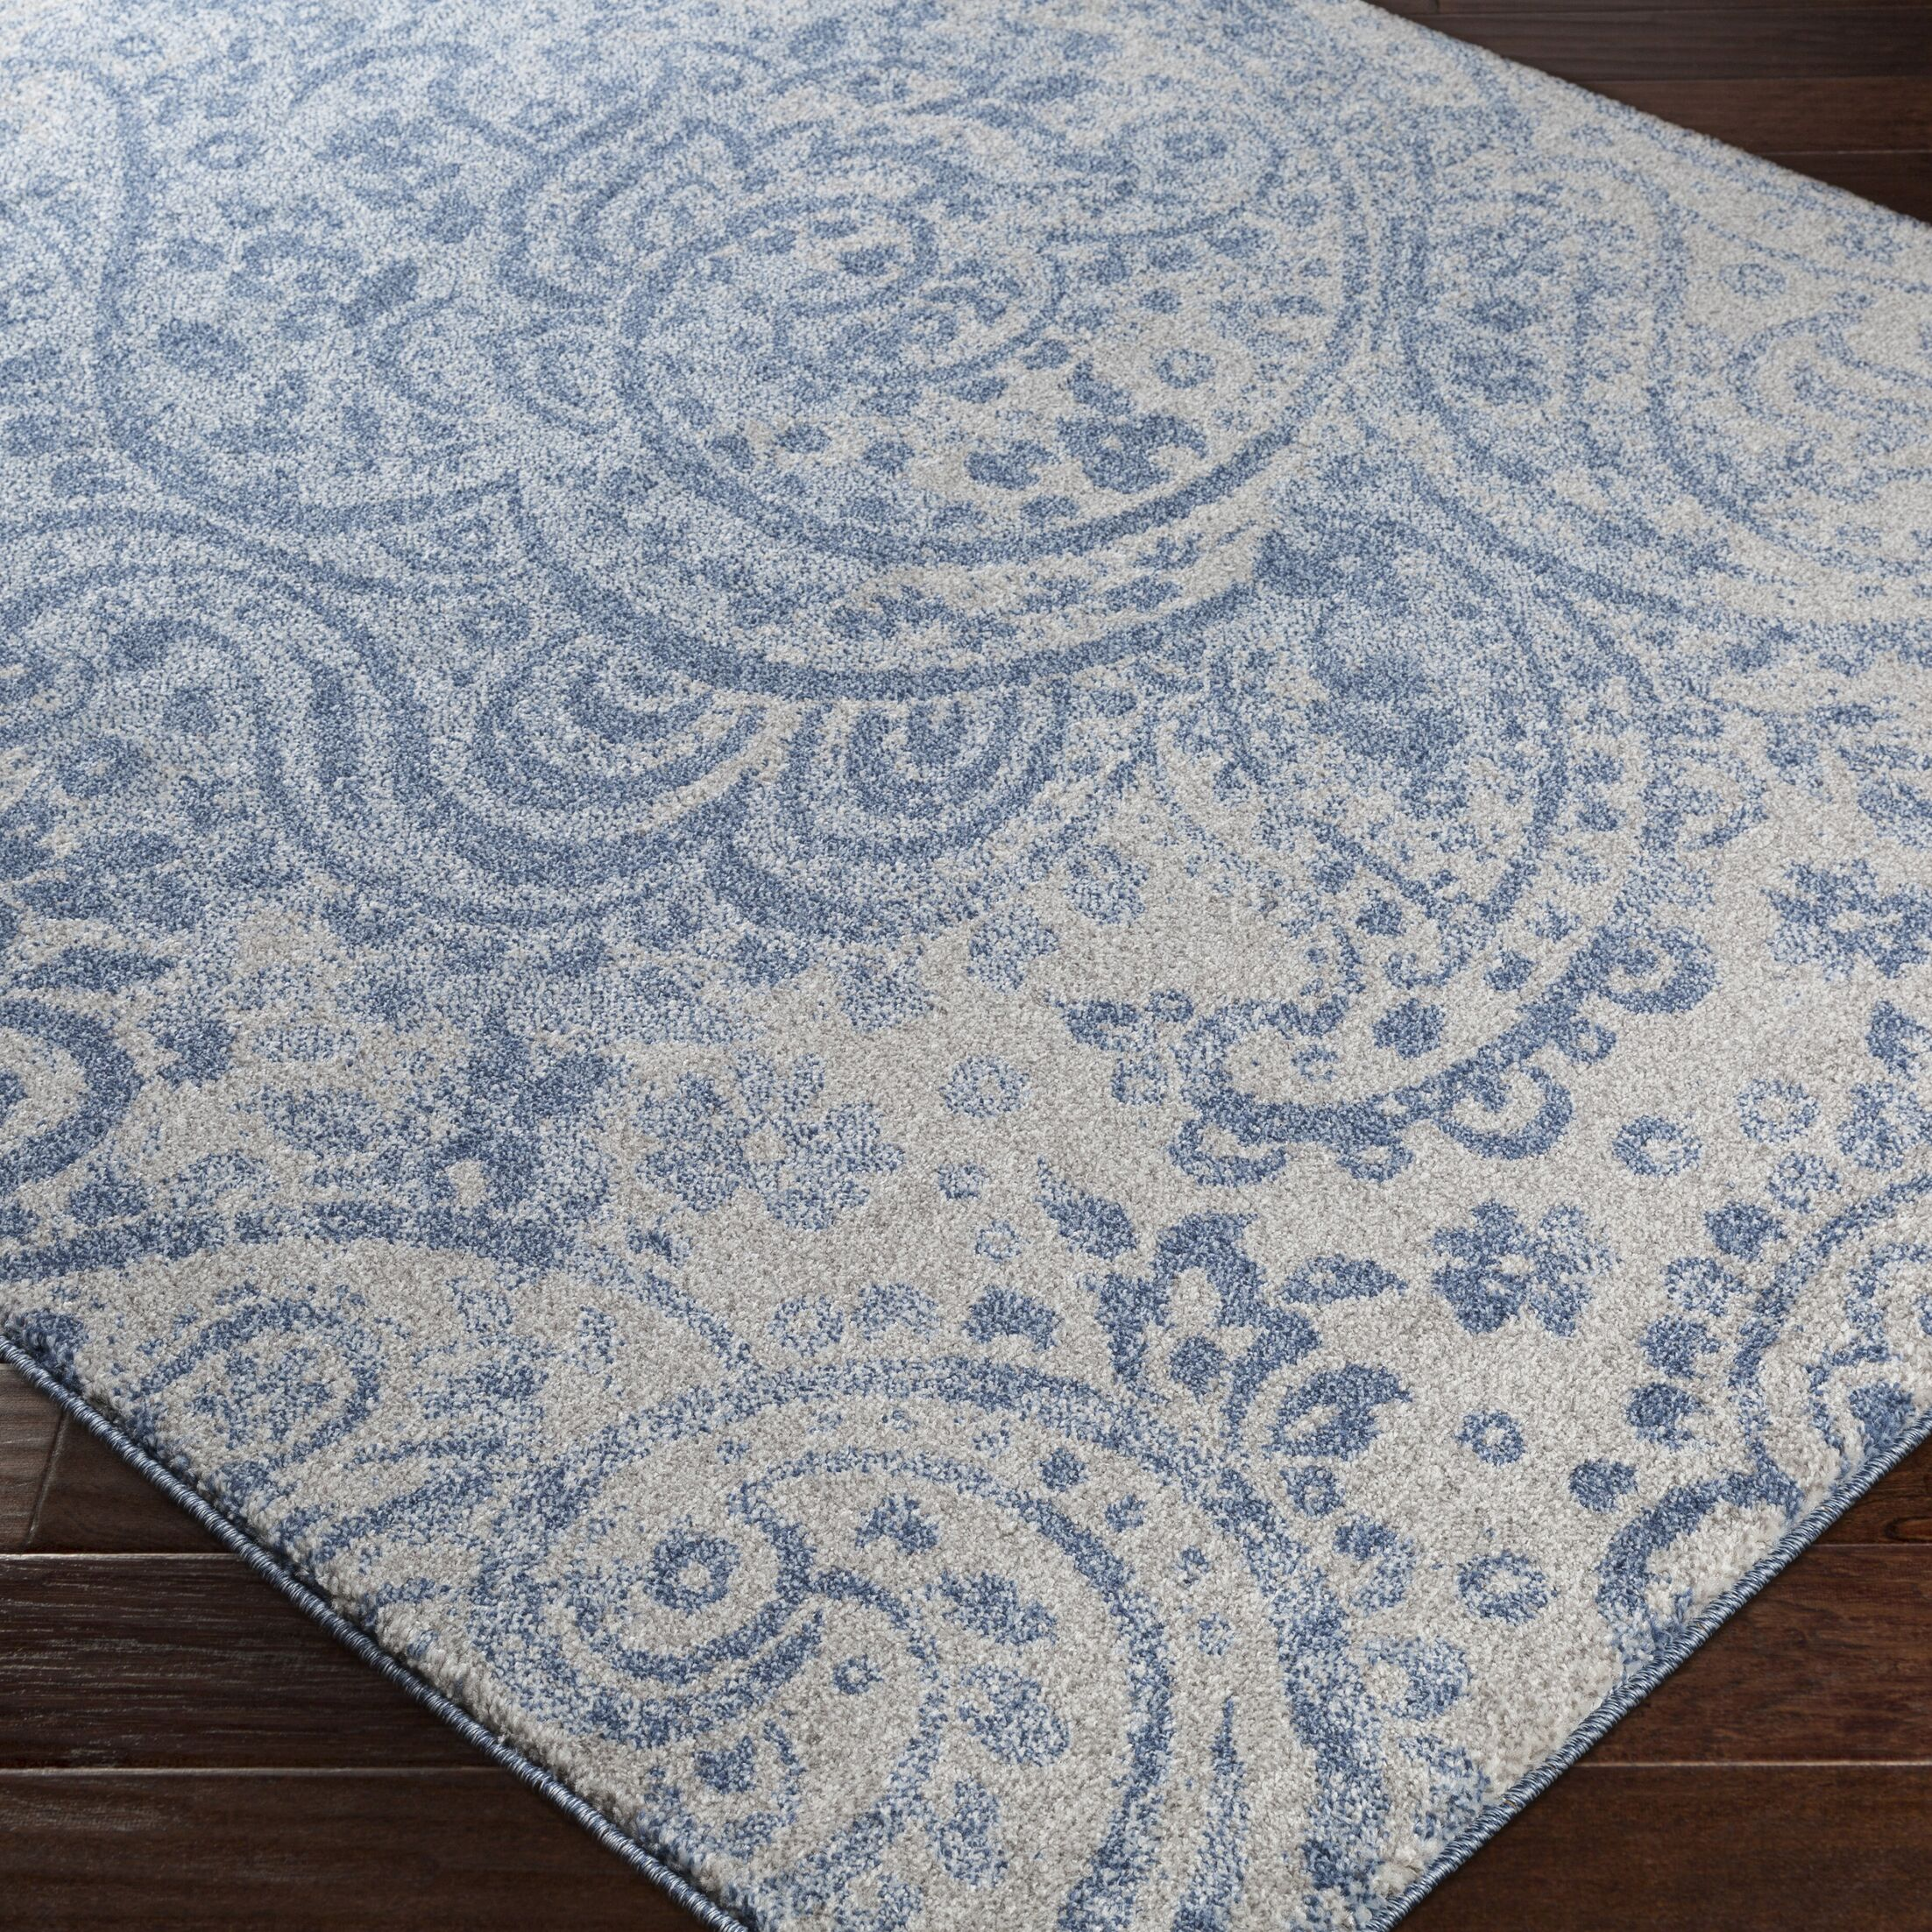 Carmel Gray/Blue Area Rug Rug Size: Rectangle 7'10